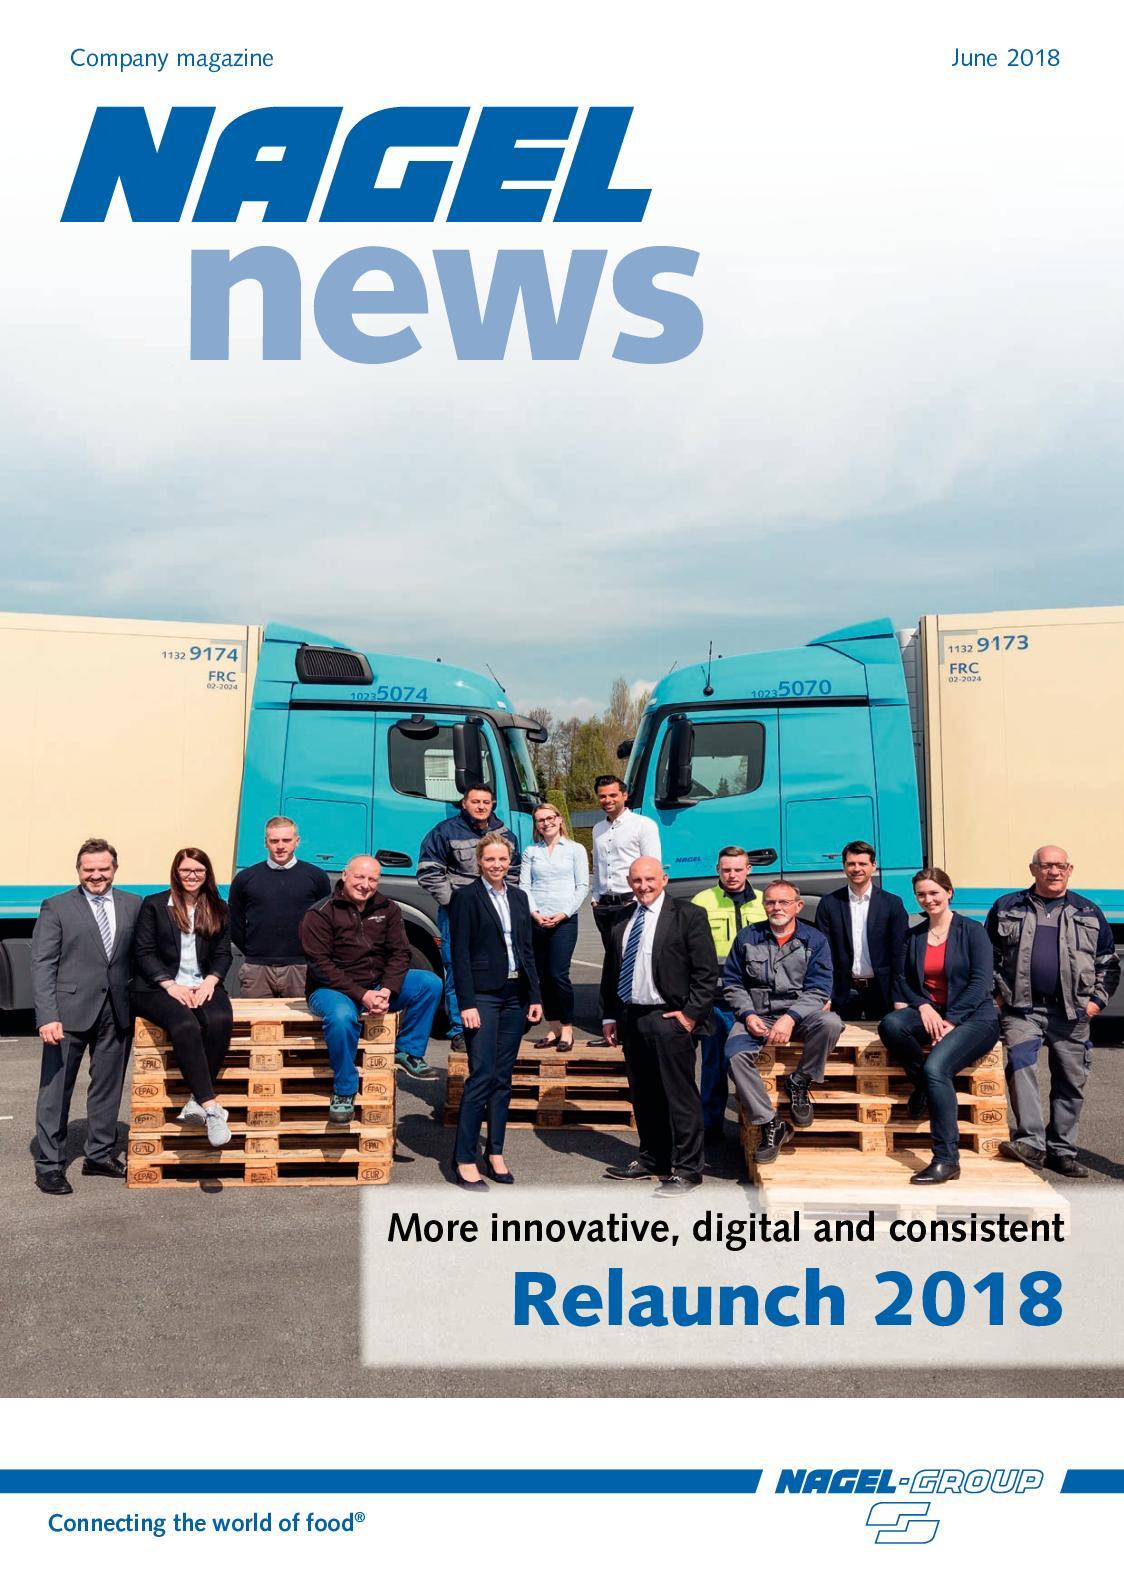 Calaméo - Relaunch 2018